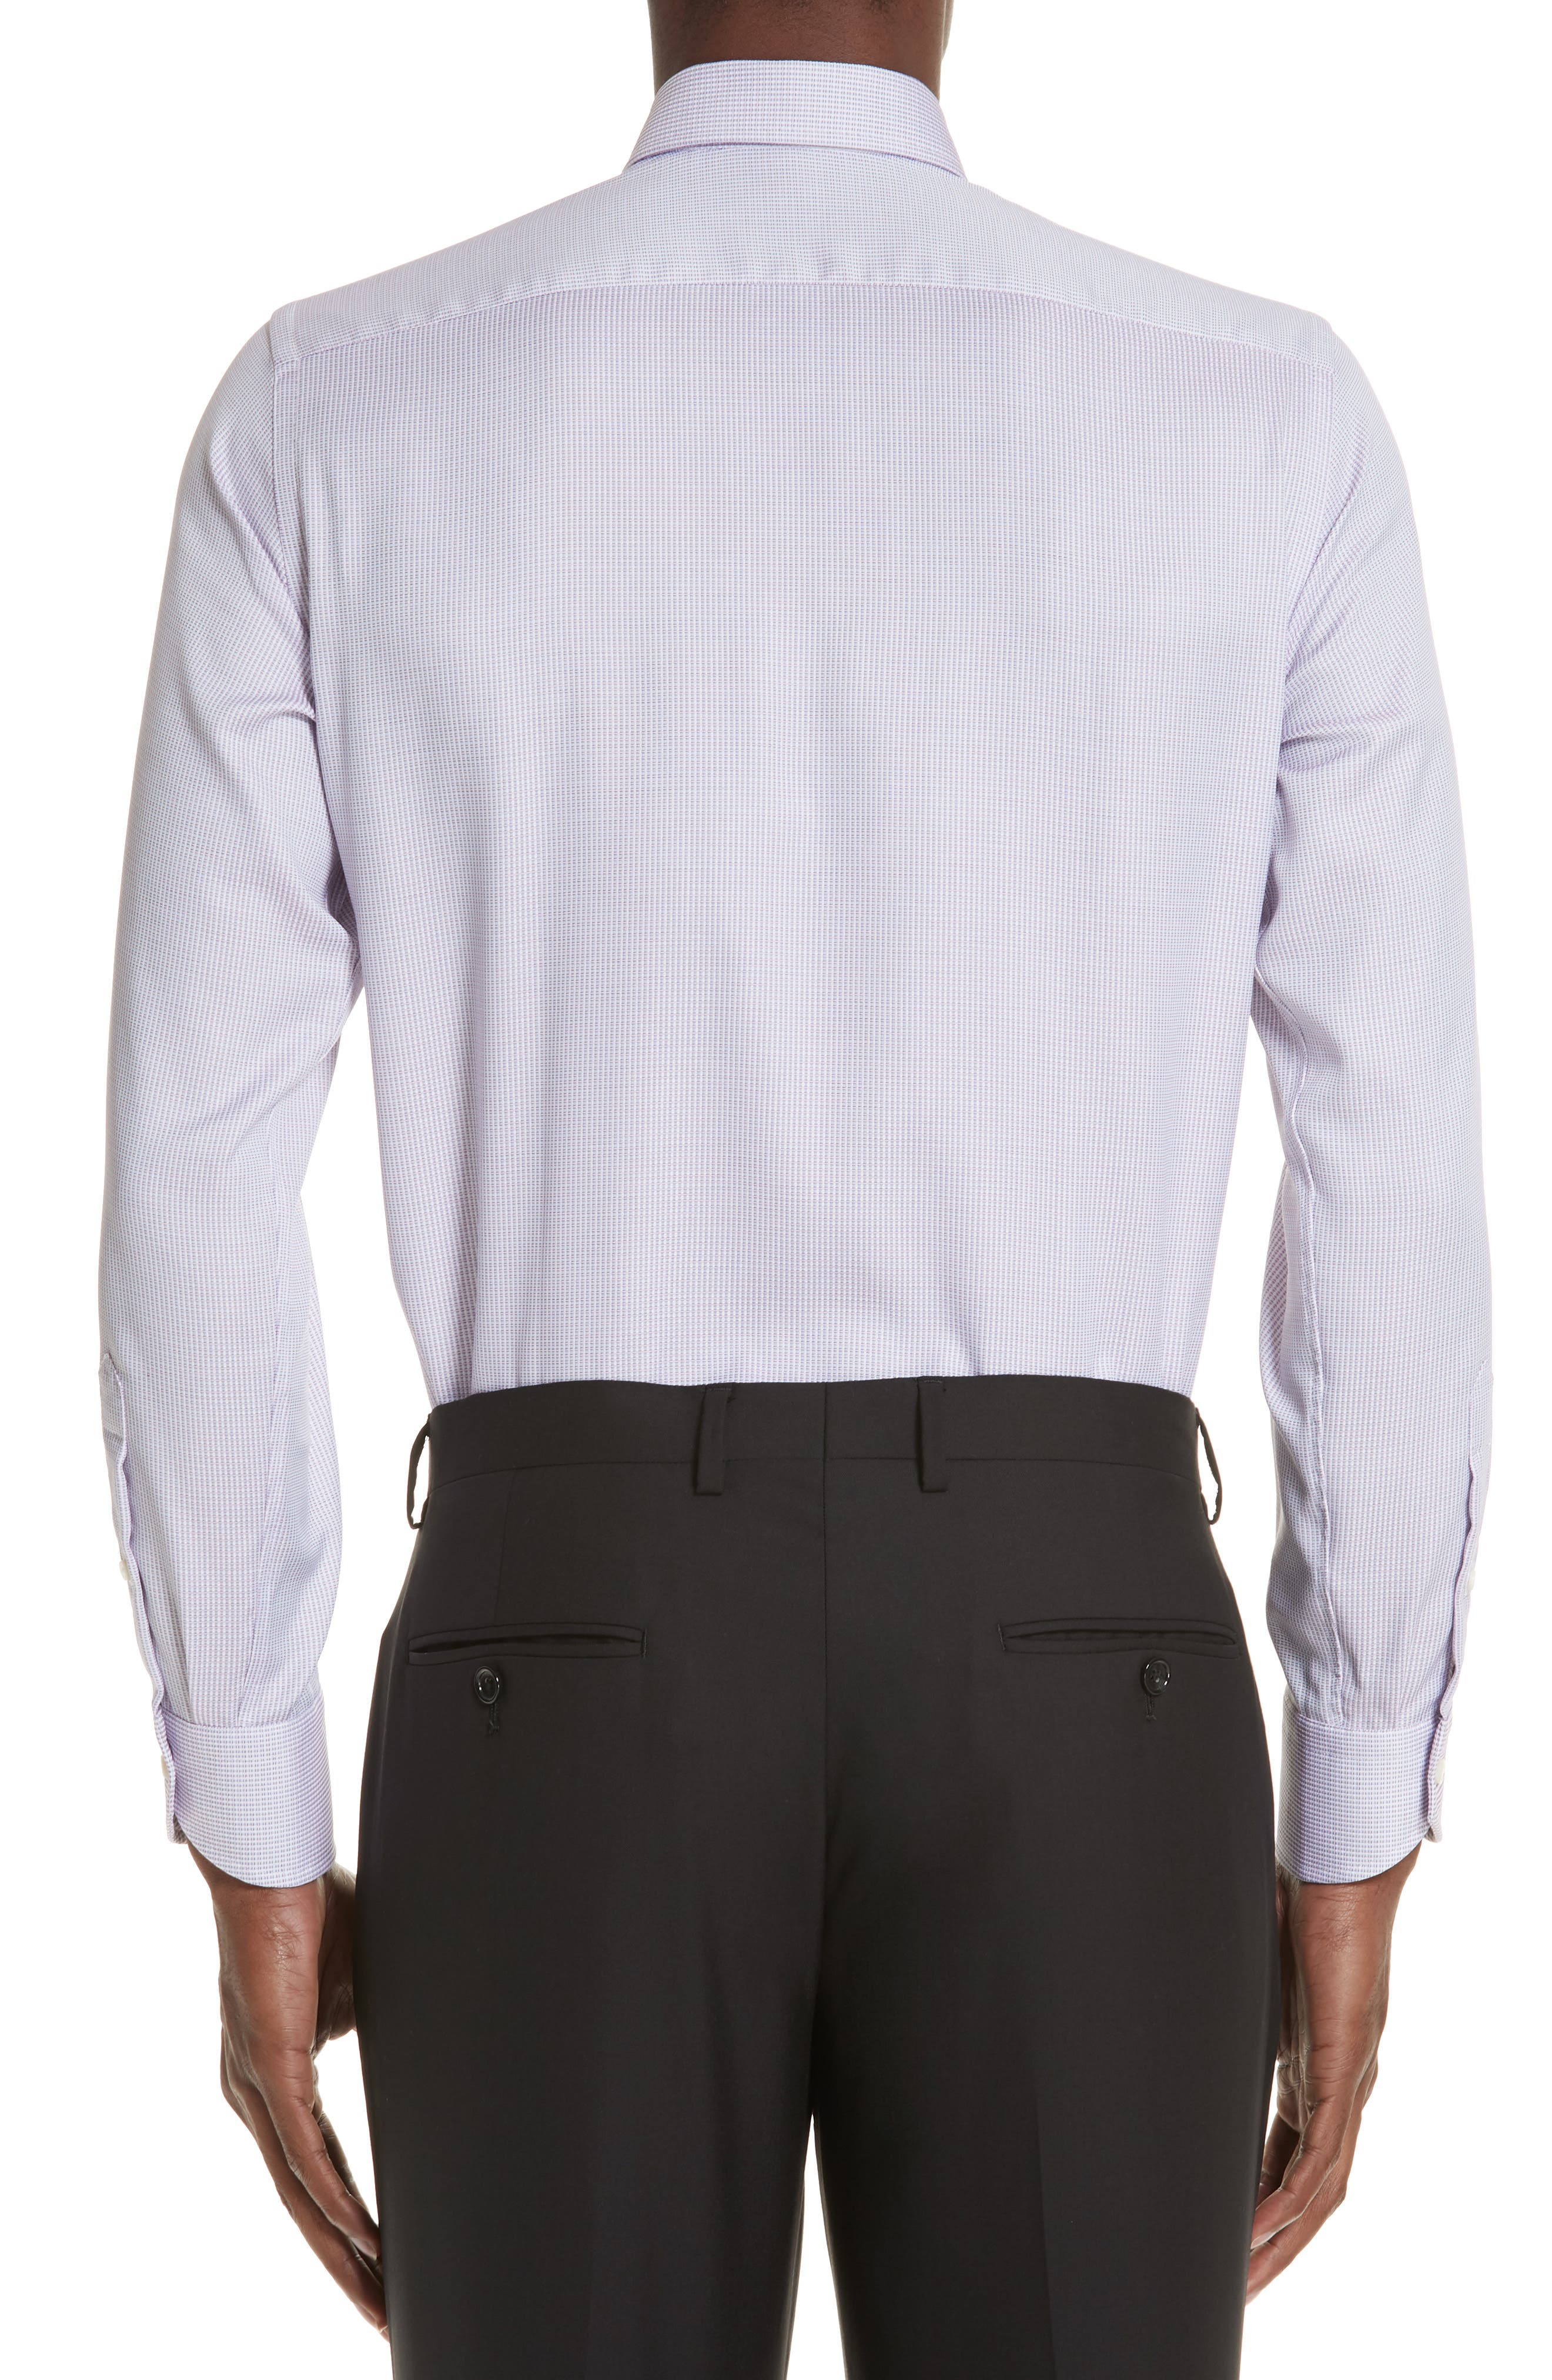 Regular Fit Stripe Dress Shirt,                             Alternate thumbnail 3, color,                             Light Pink